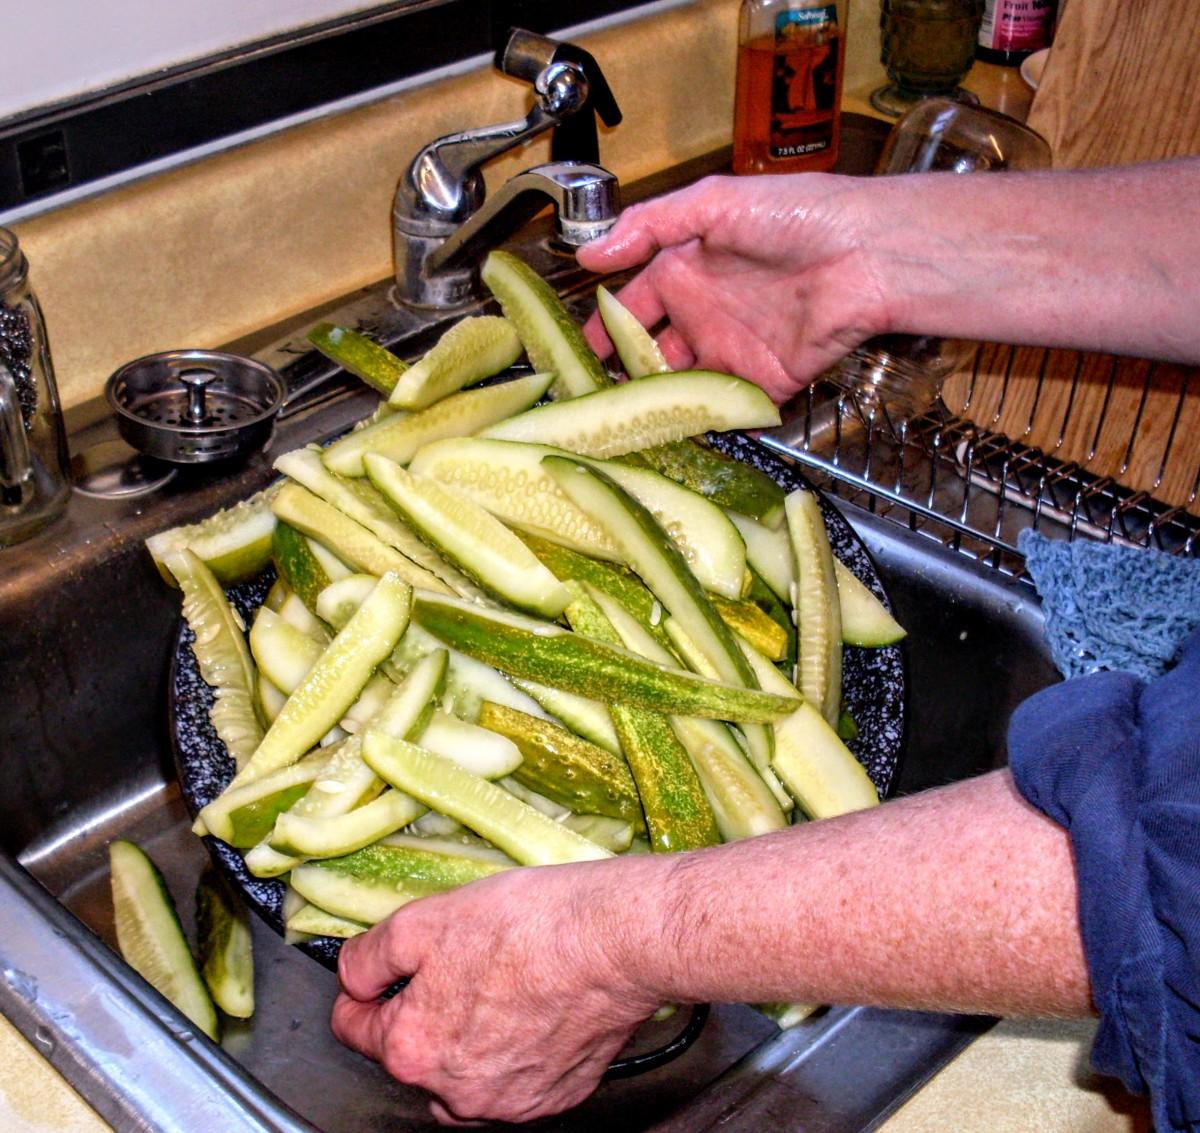 Drain water off cucumber sticks.